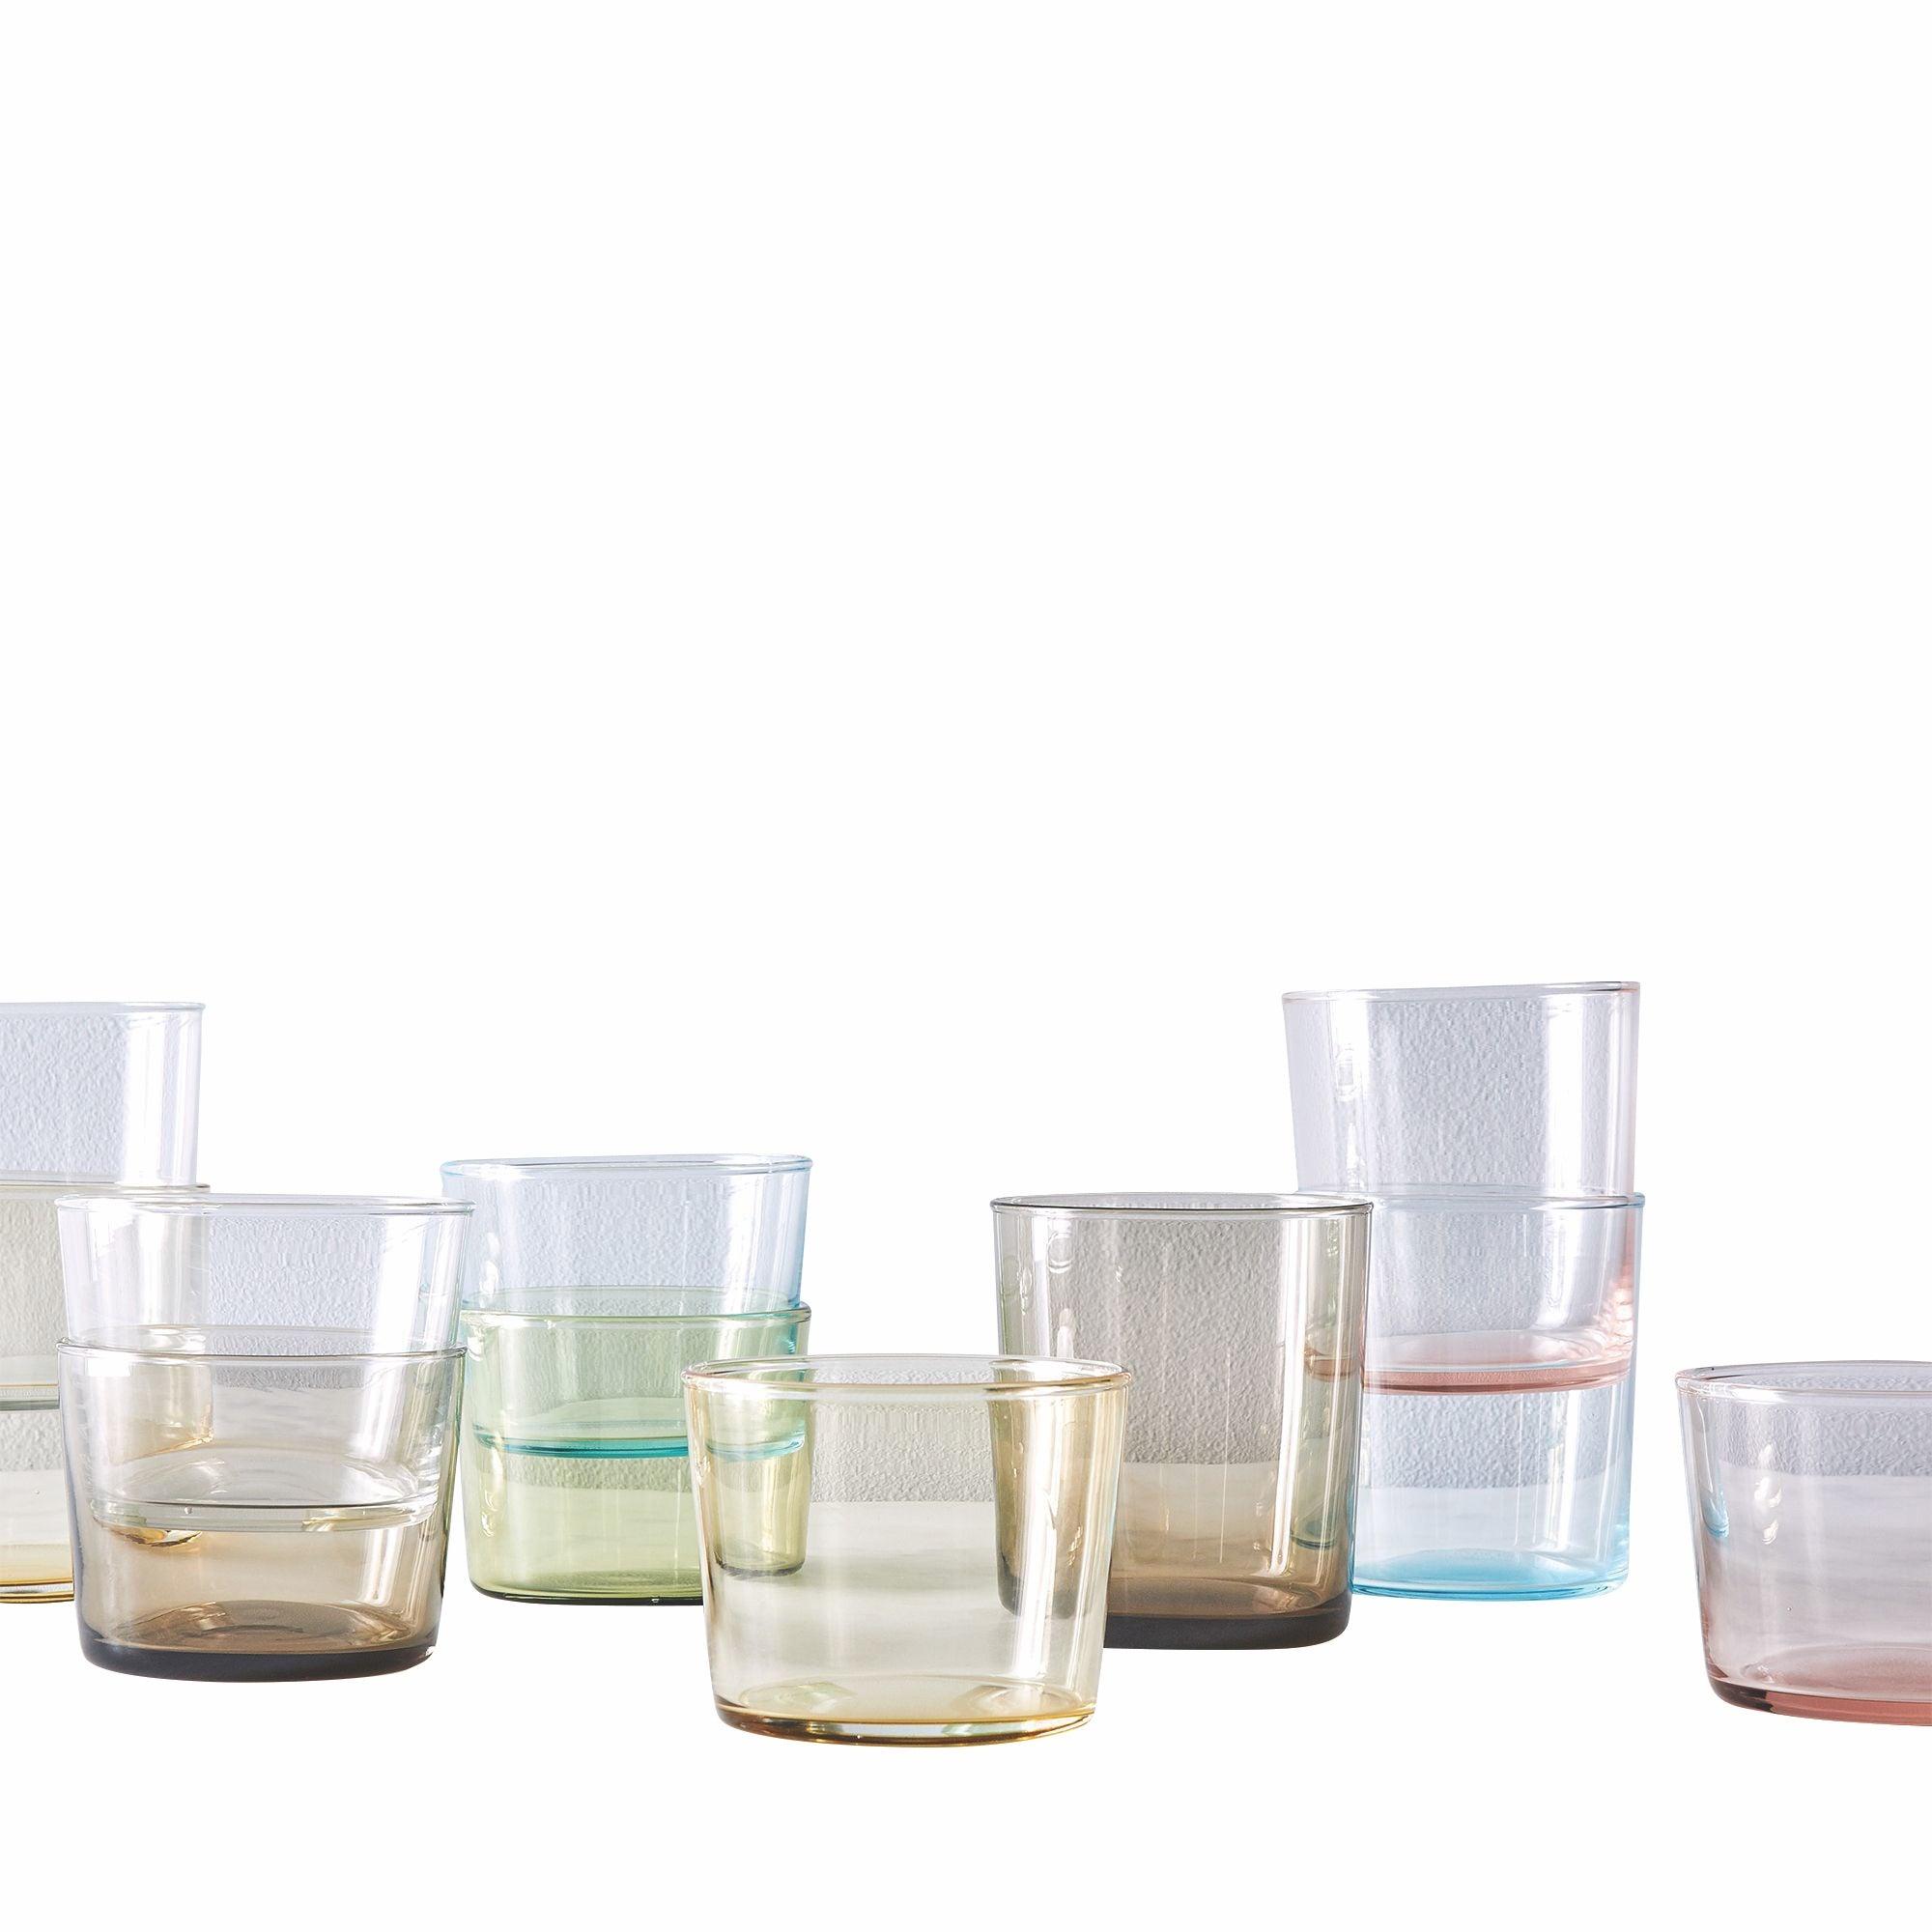 882d33e6-cc43-4ade-9fd9-fb8d4d440e36–2018-0628_hawkins-new-york_mouthblown-chroma-stackable-glassware-set-of-6_family_silo_rocky-luten_012